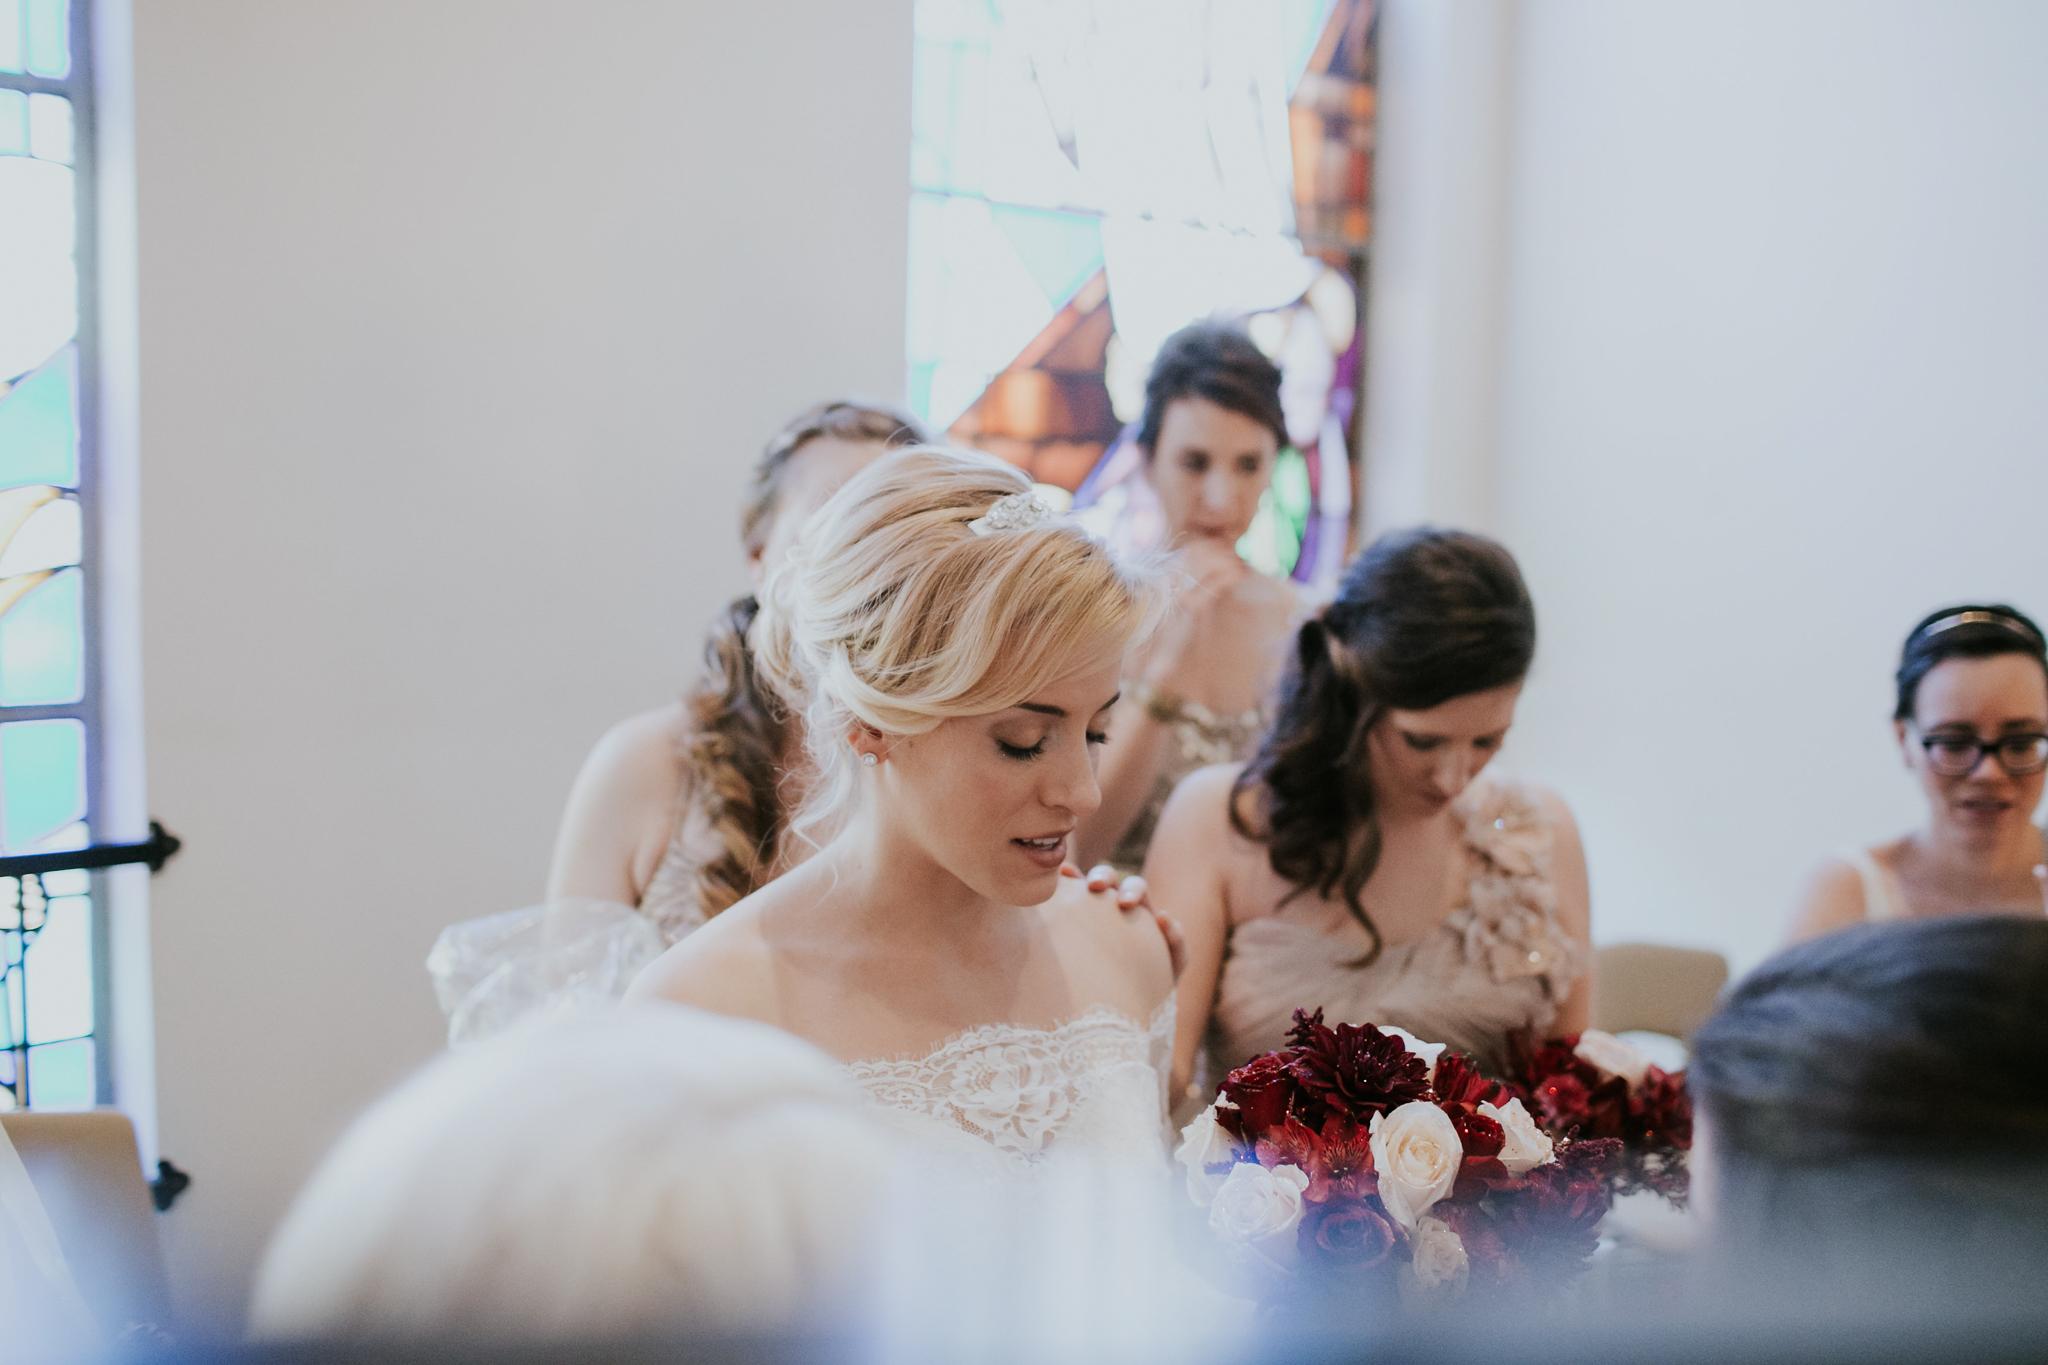 20151230_hussem_wedding_0298_web.jpg